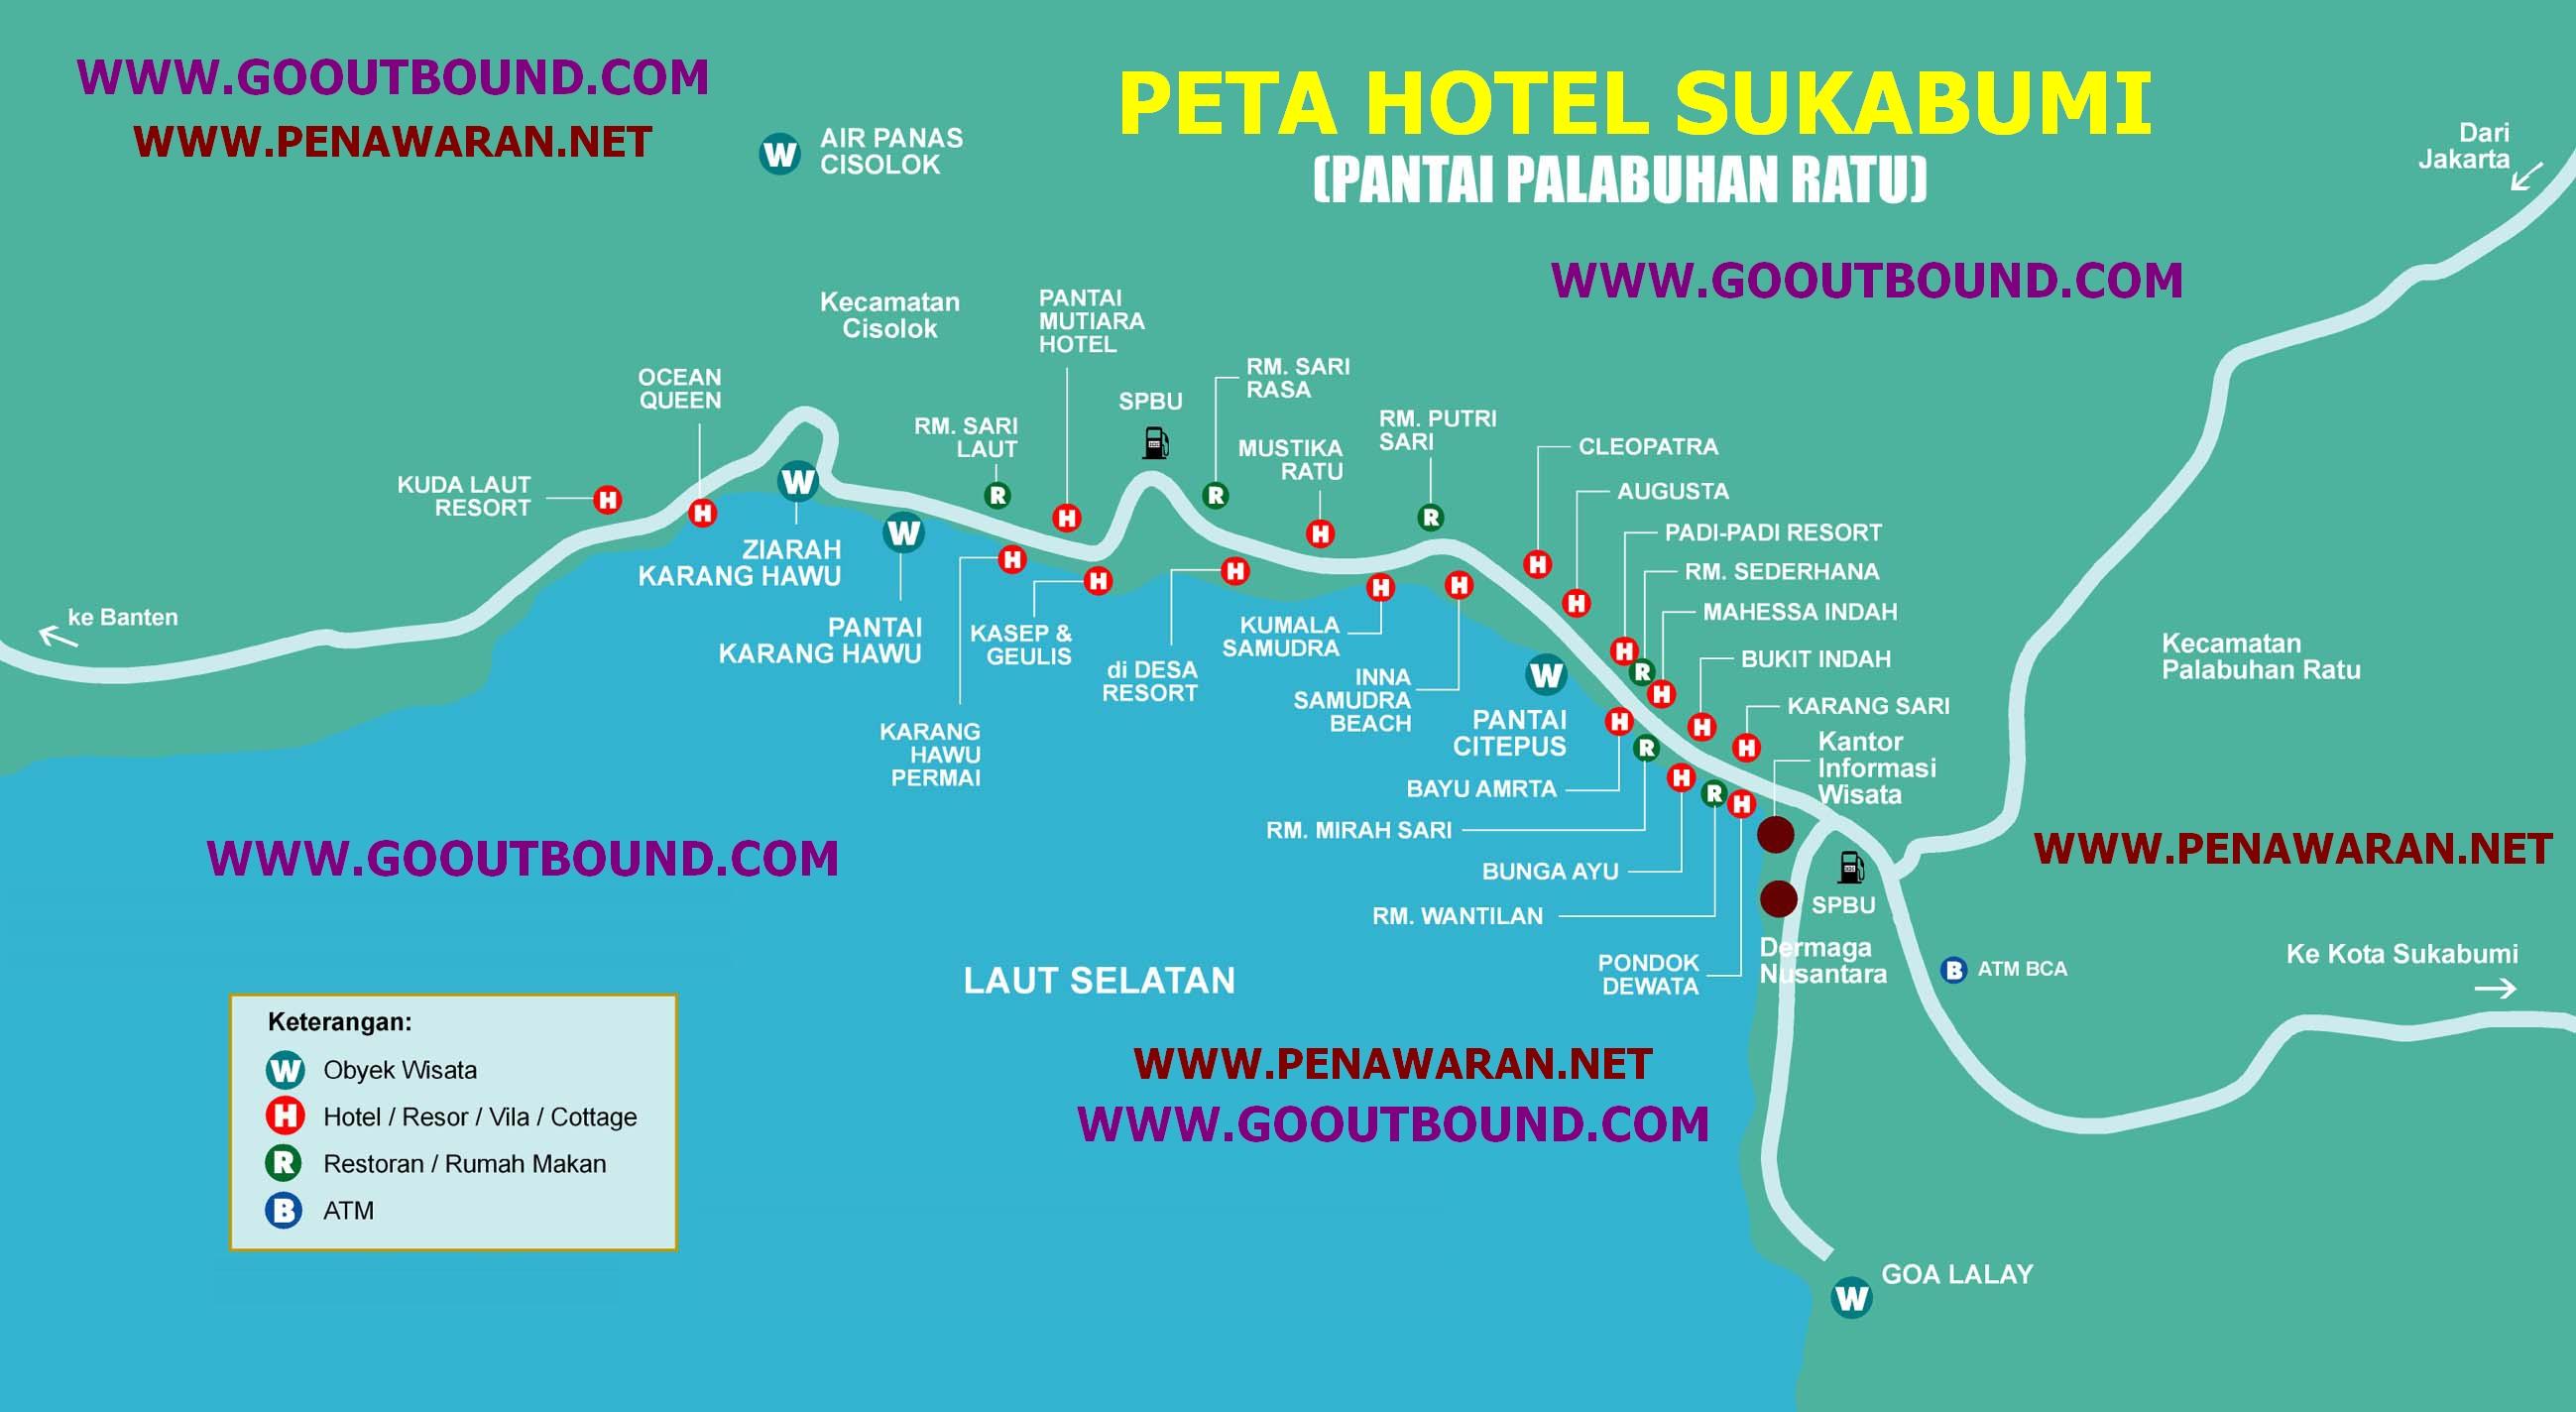 peta-daftar-hotel-sukabumi-jawa-barat